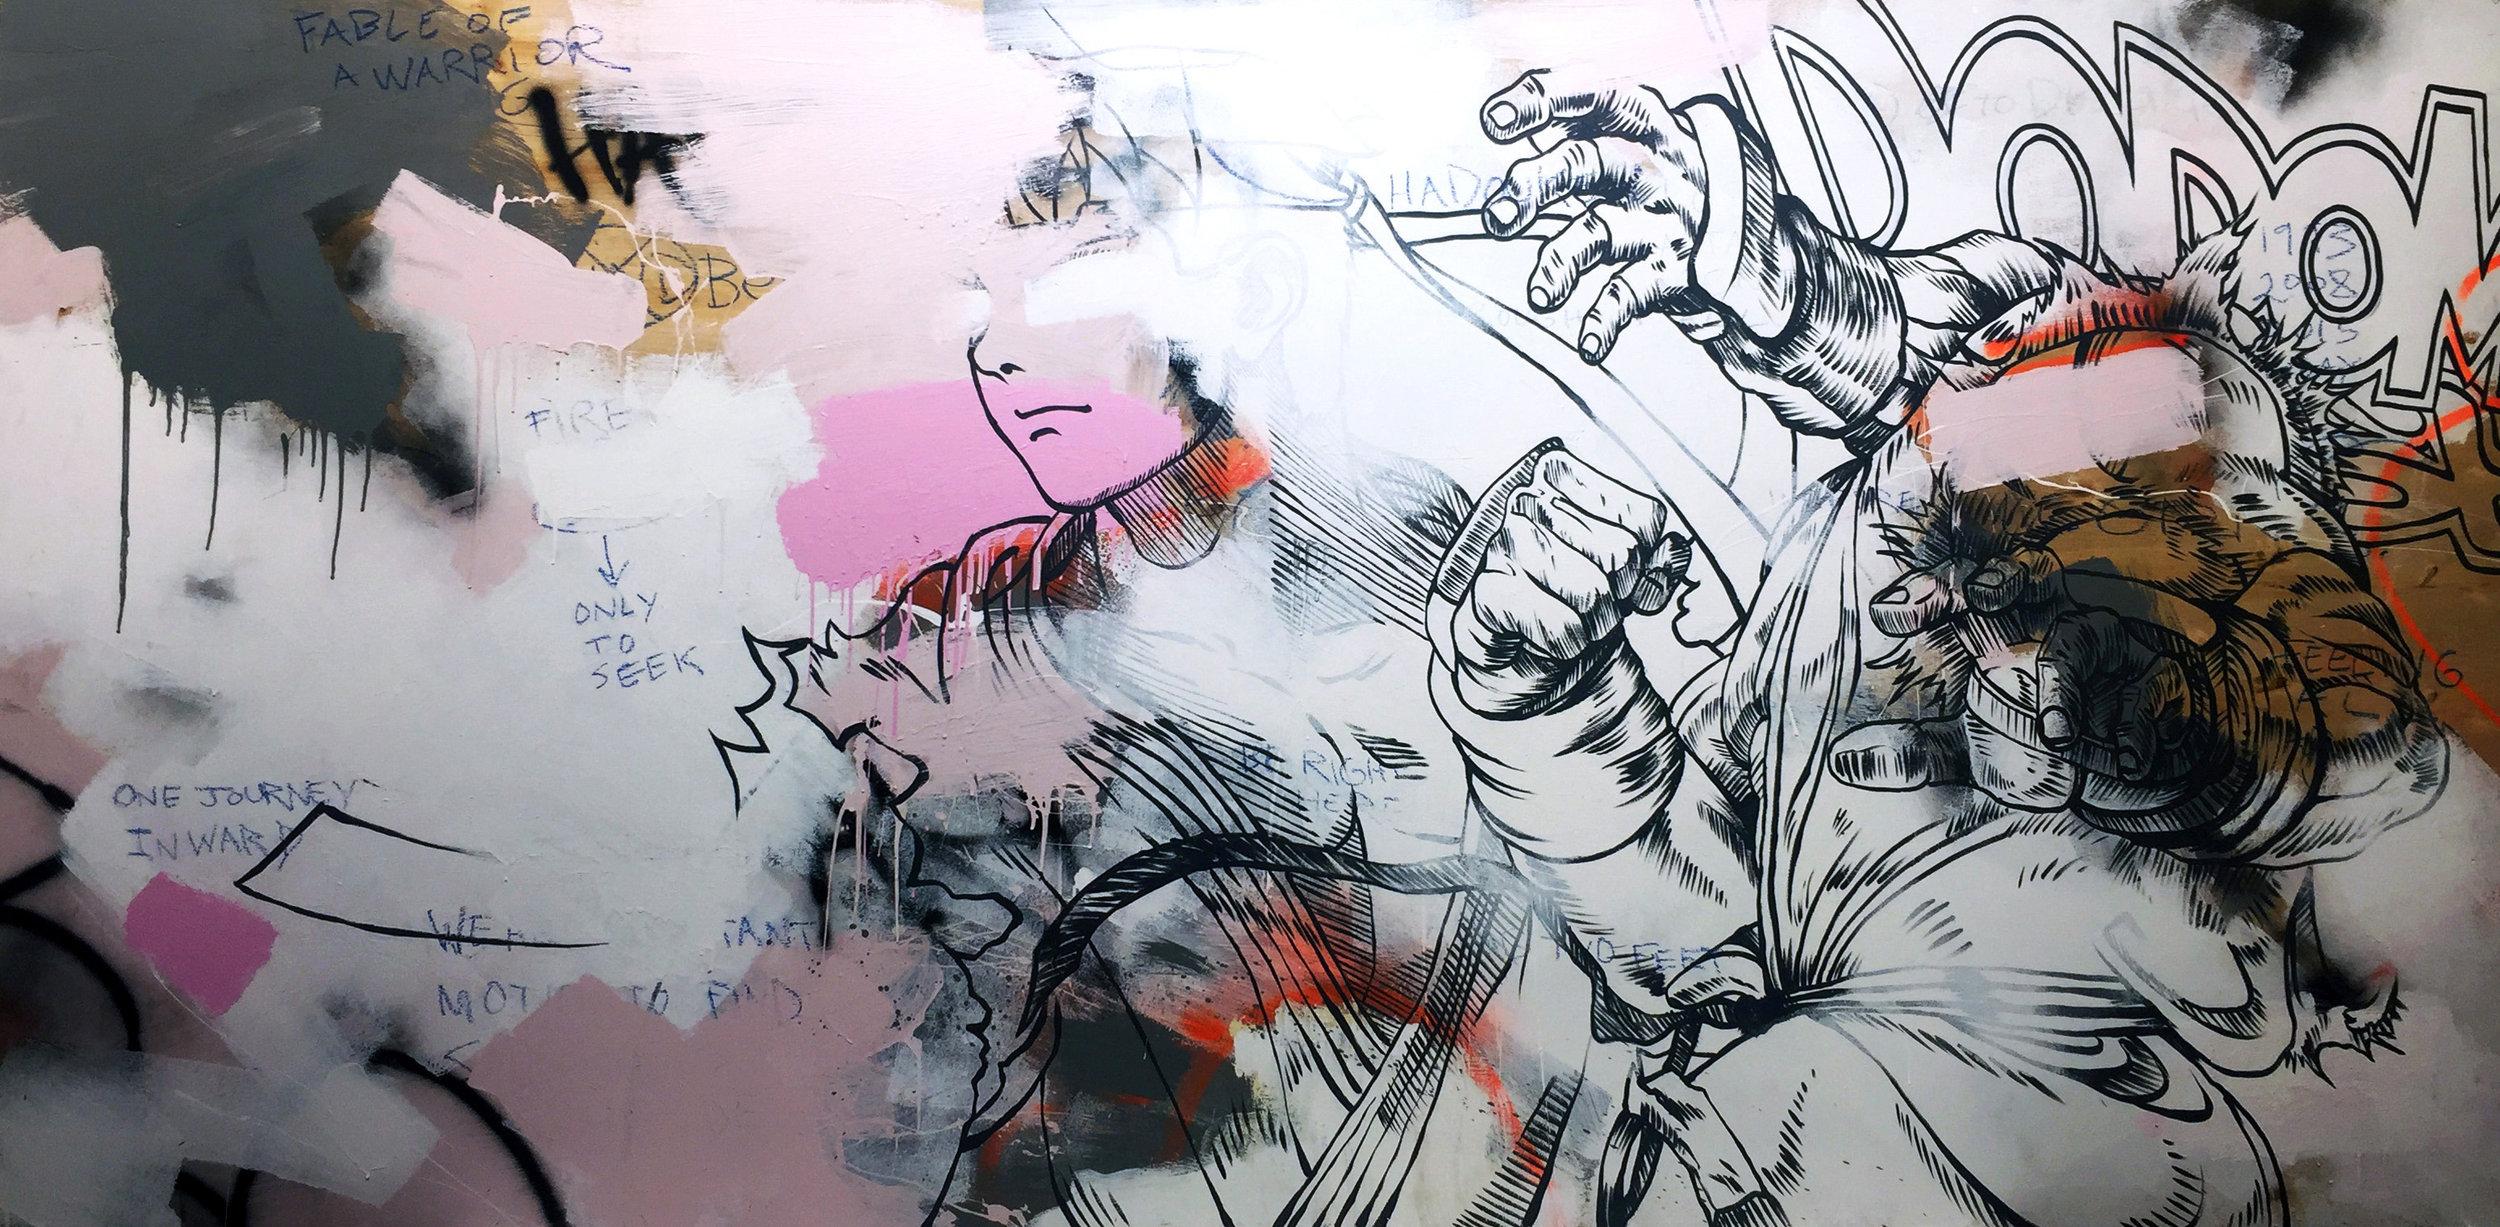 Hadouken, 9'x4', Painting on Found Wood Panel, 2017, $7000